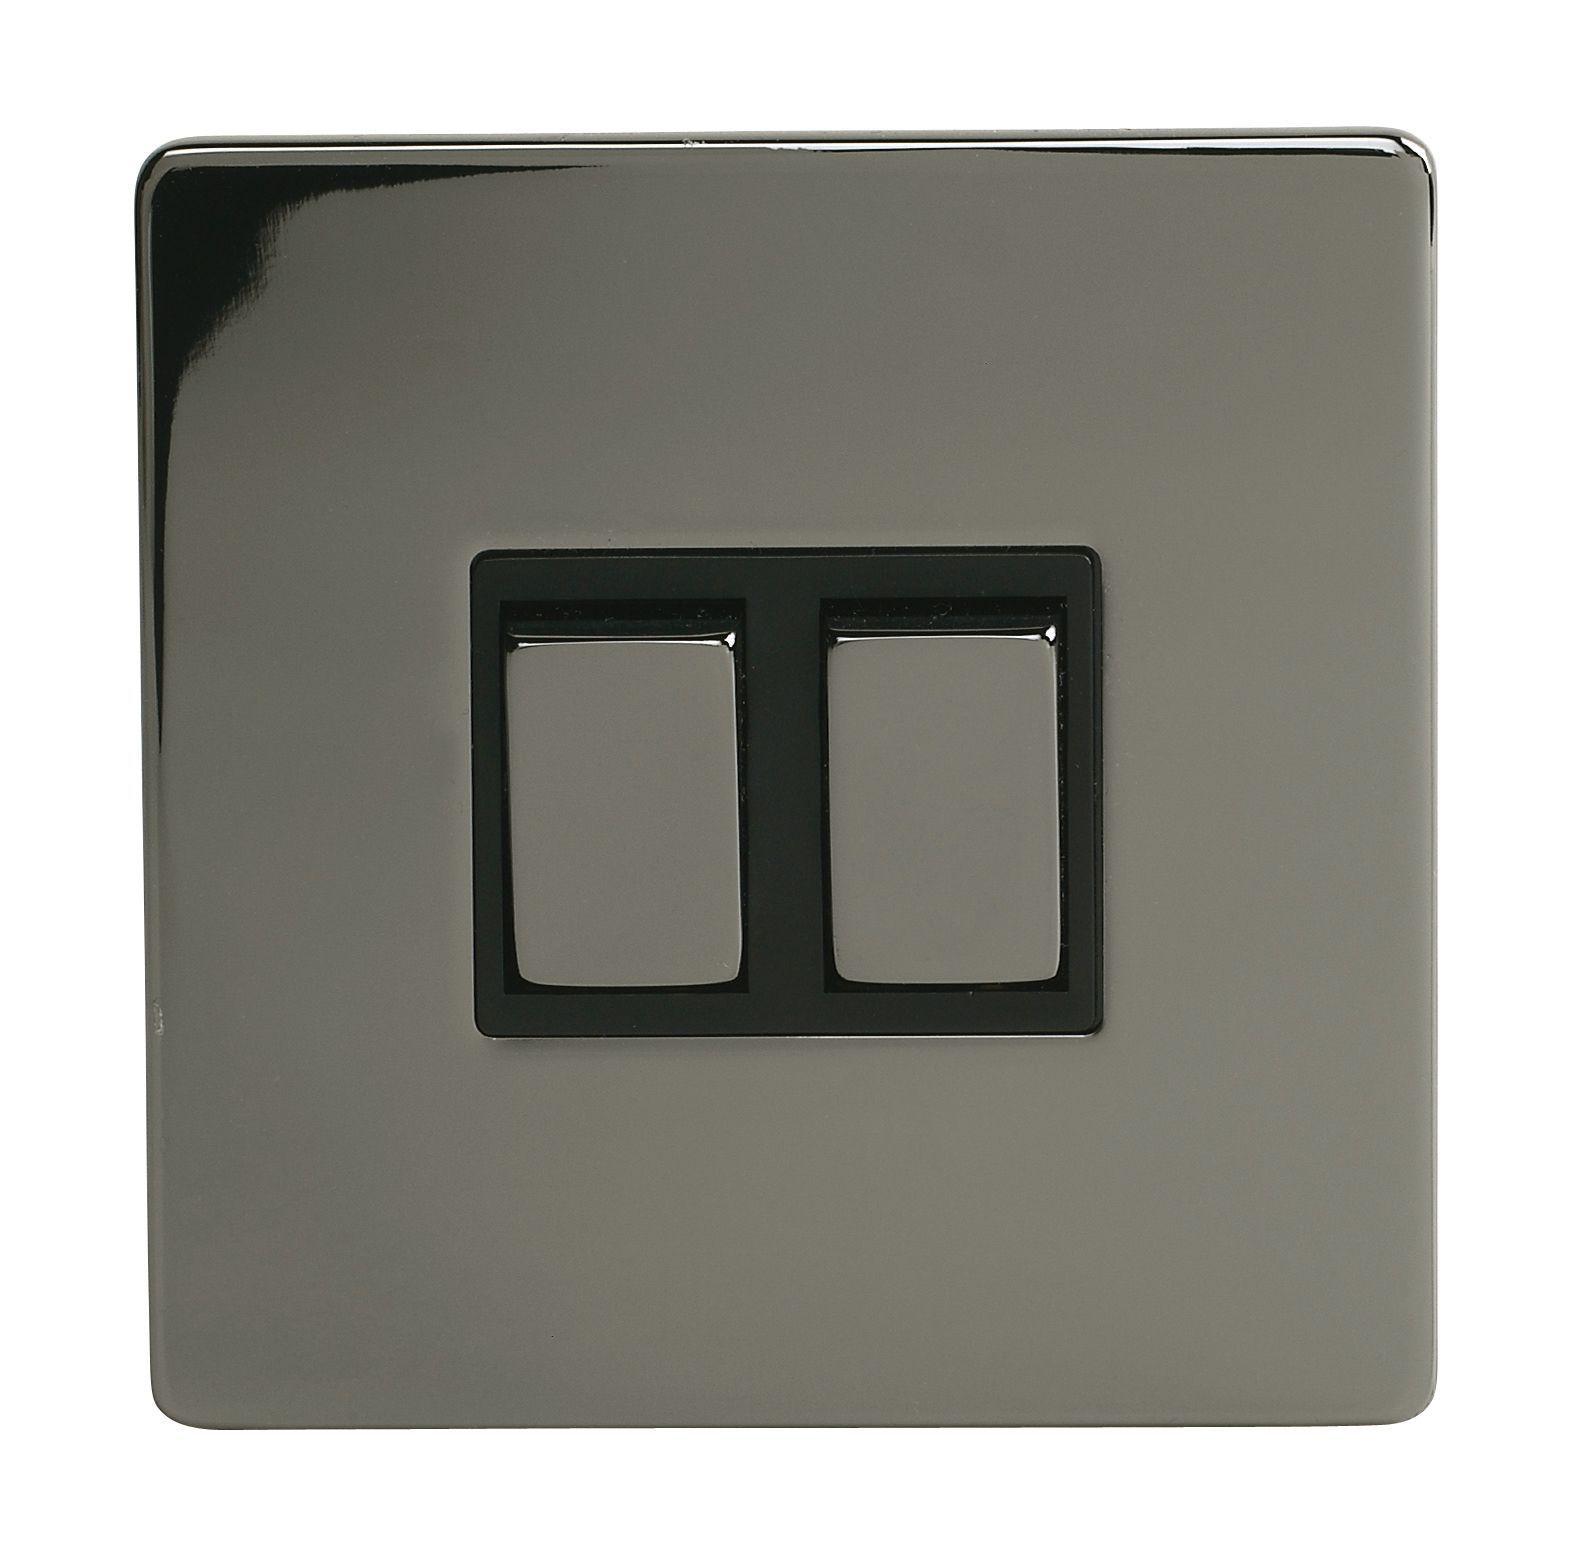 Holder 10a 2-way Double Iridium Black Light Switch